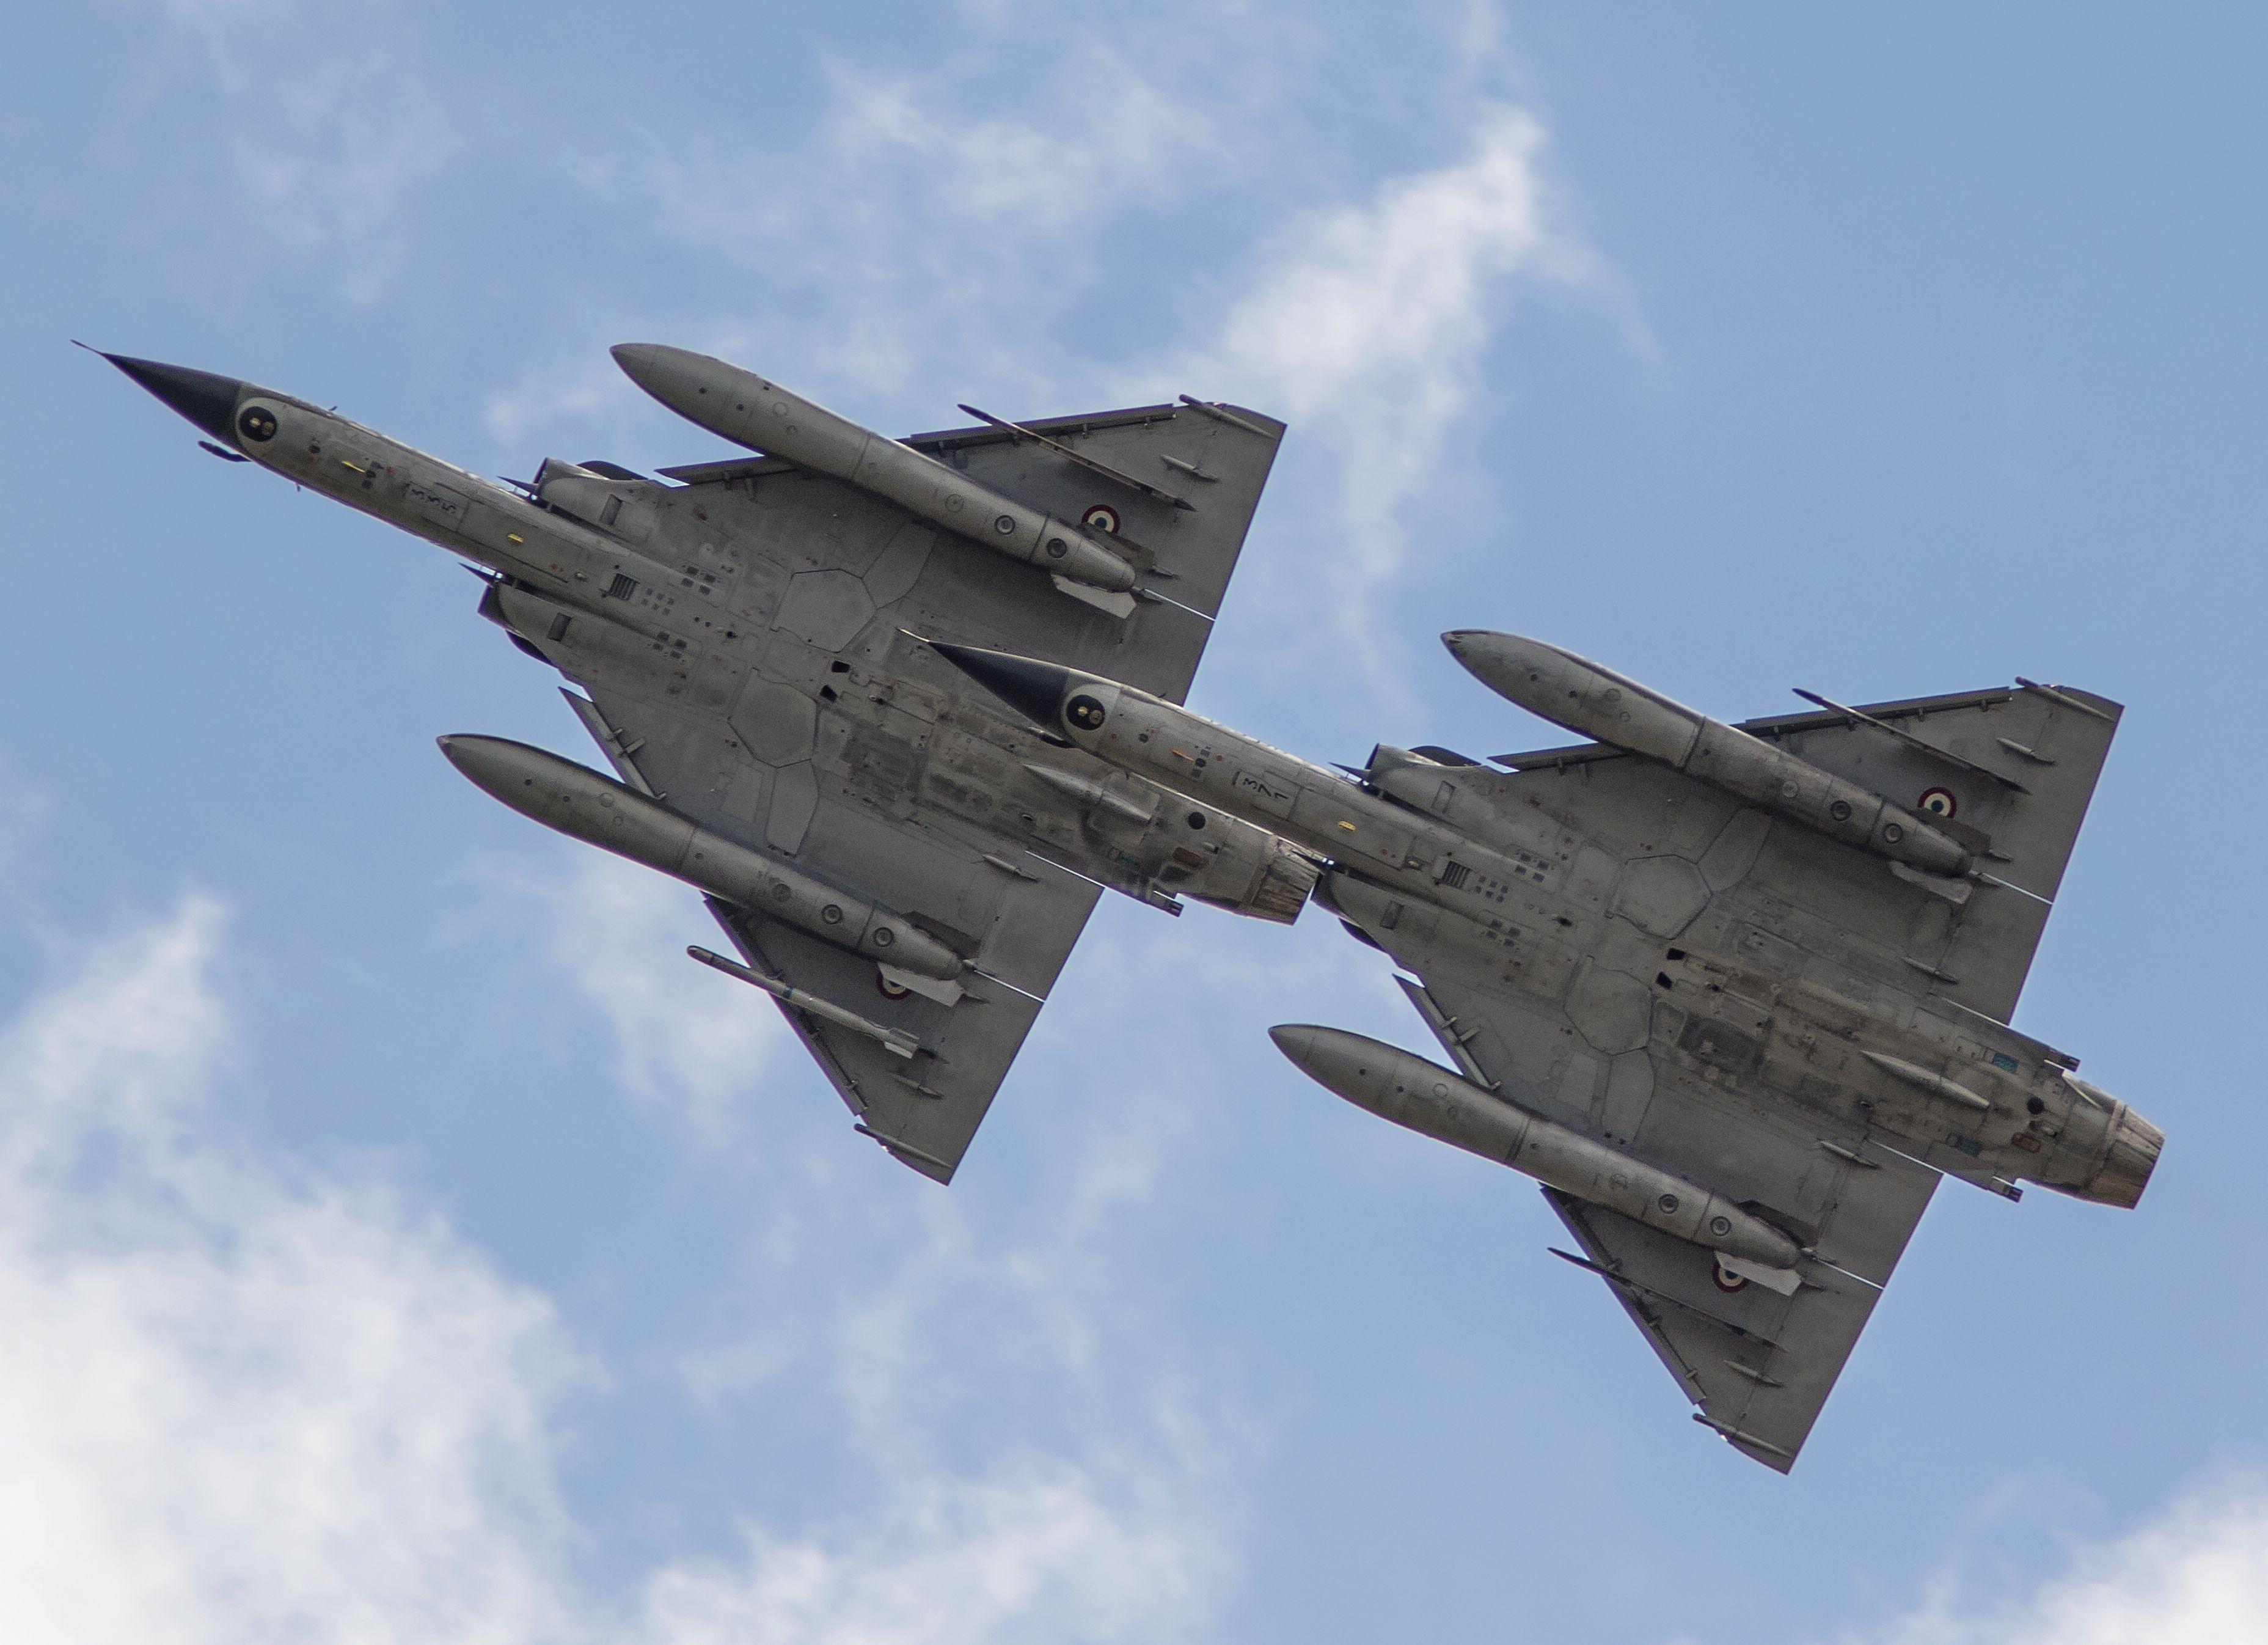 Military Dassault Mirage 2000 Jet Fighter Aircraft